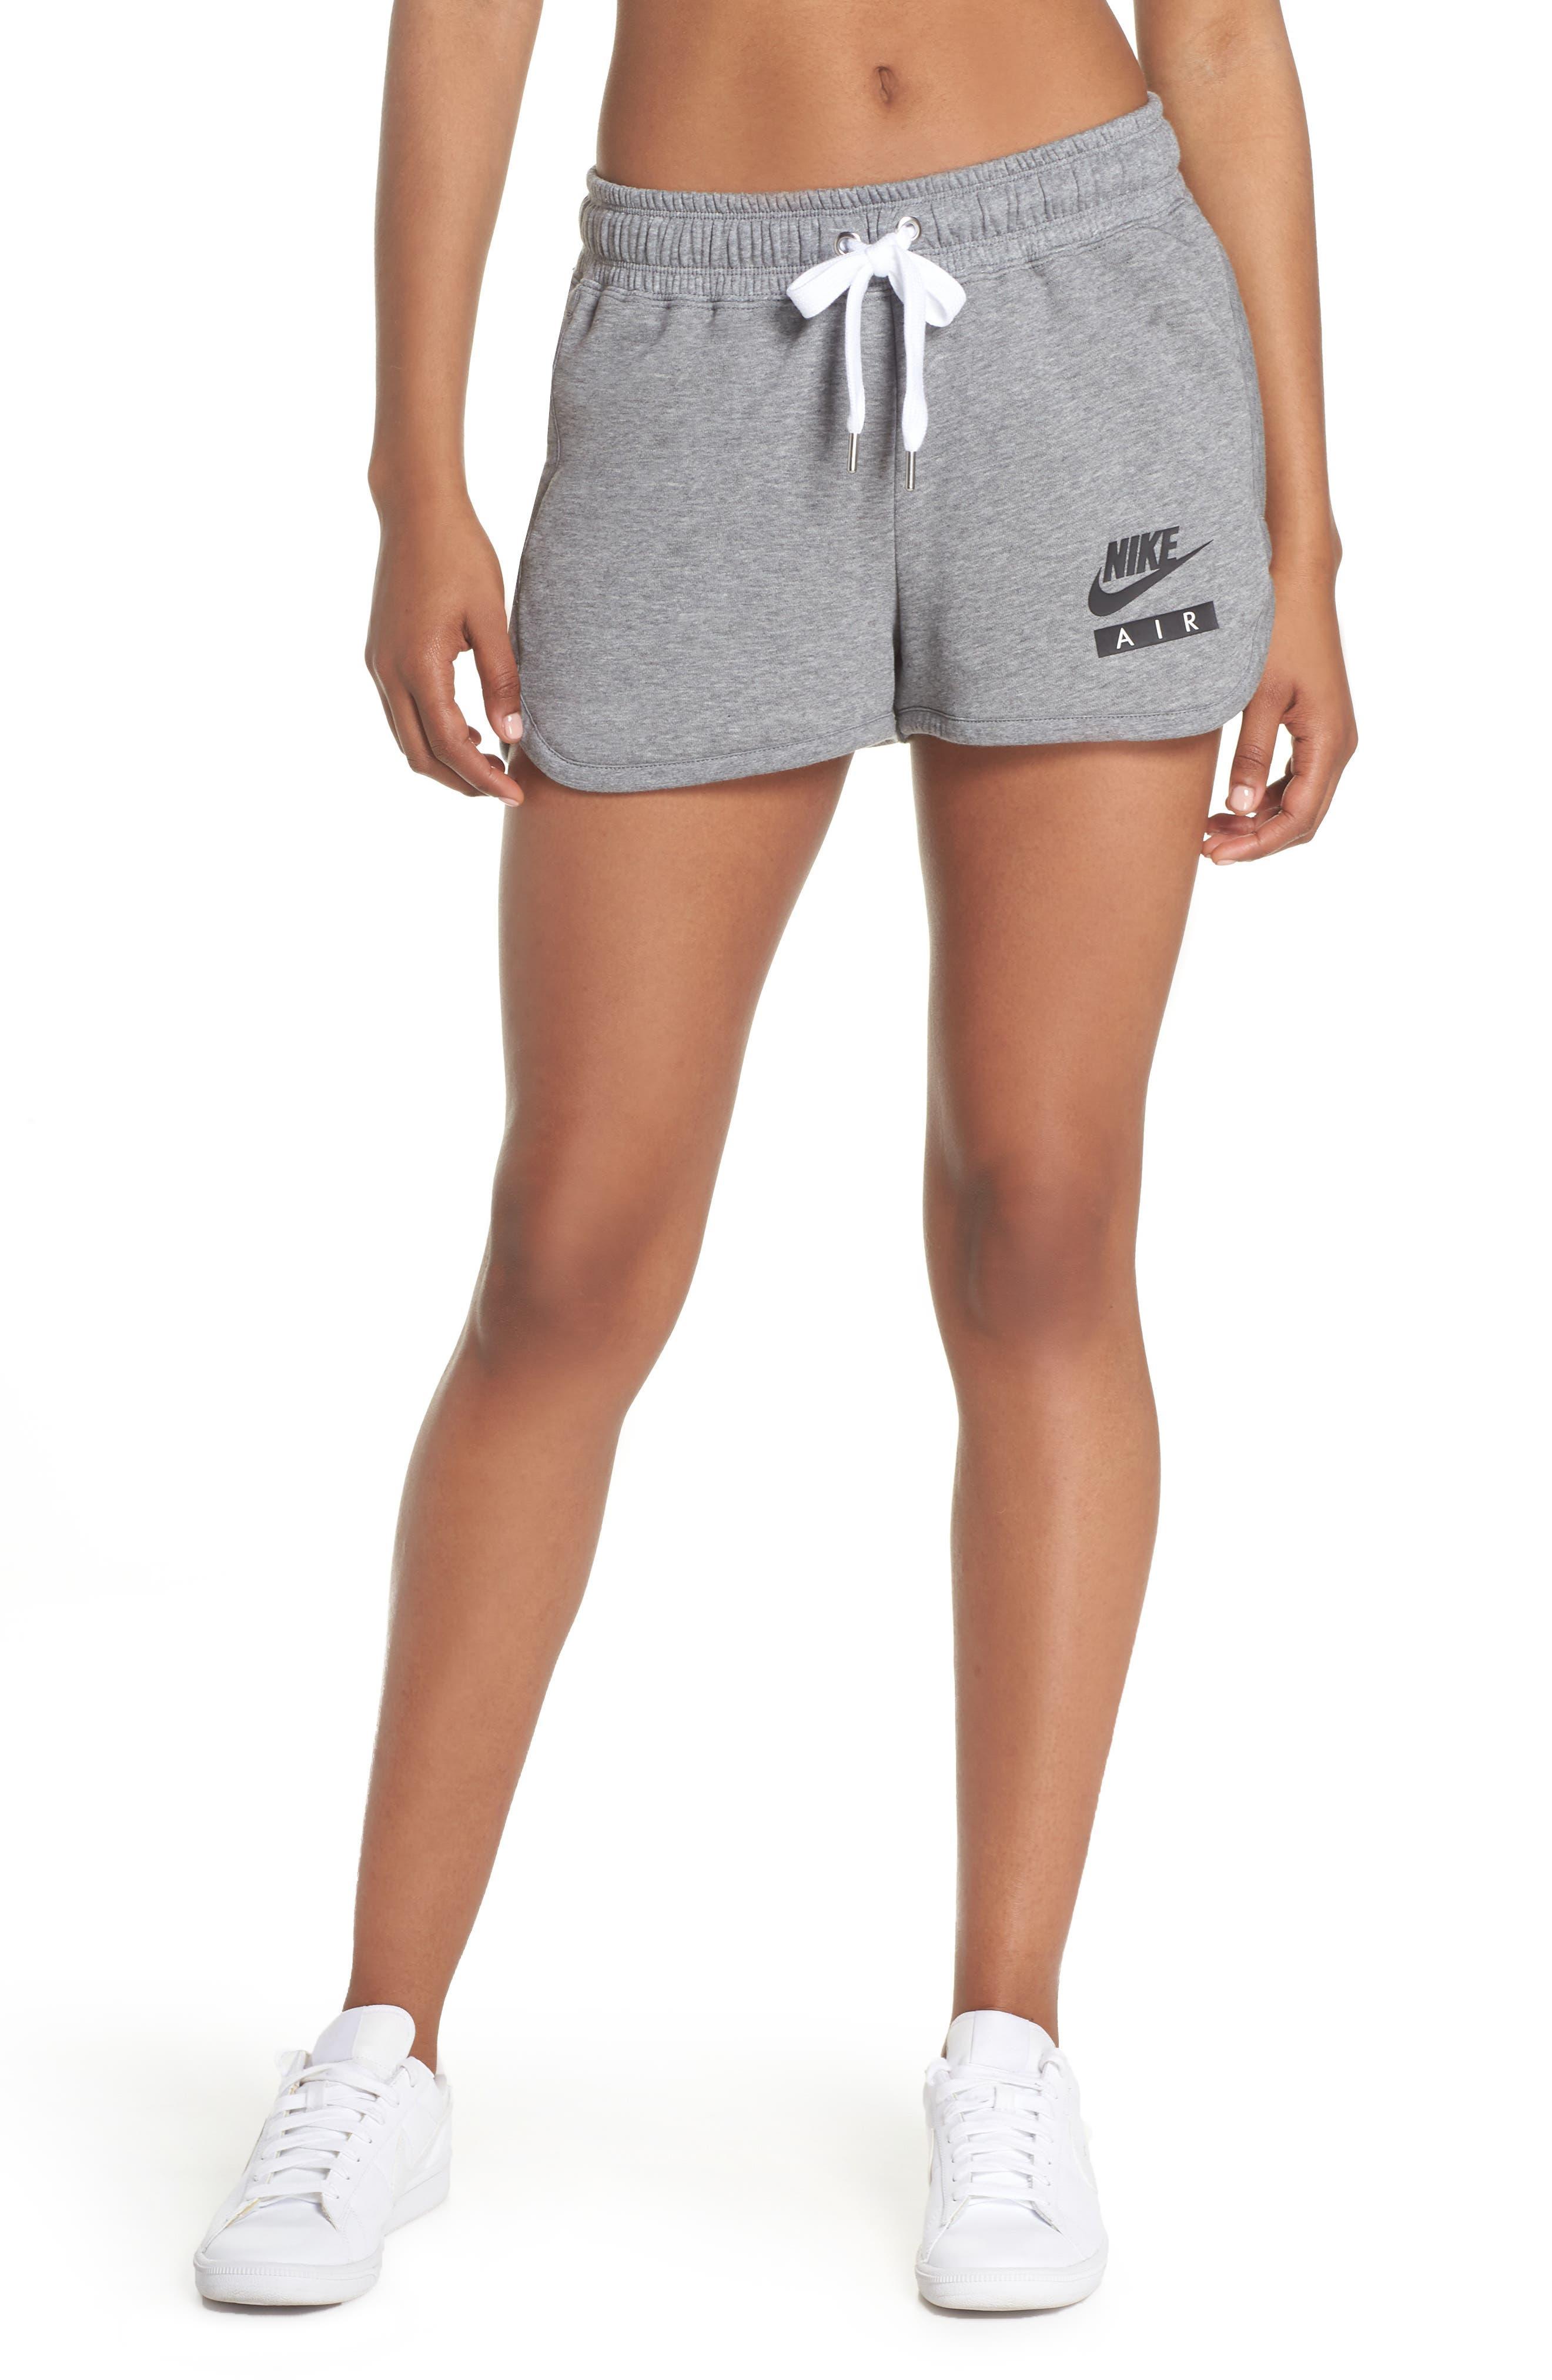 Sportswear Air Gym Shorts,                             Main thumbnail 1, color,                             Carbon Heather/ White/ Black